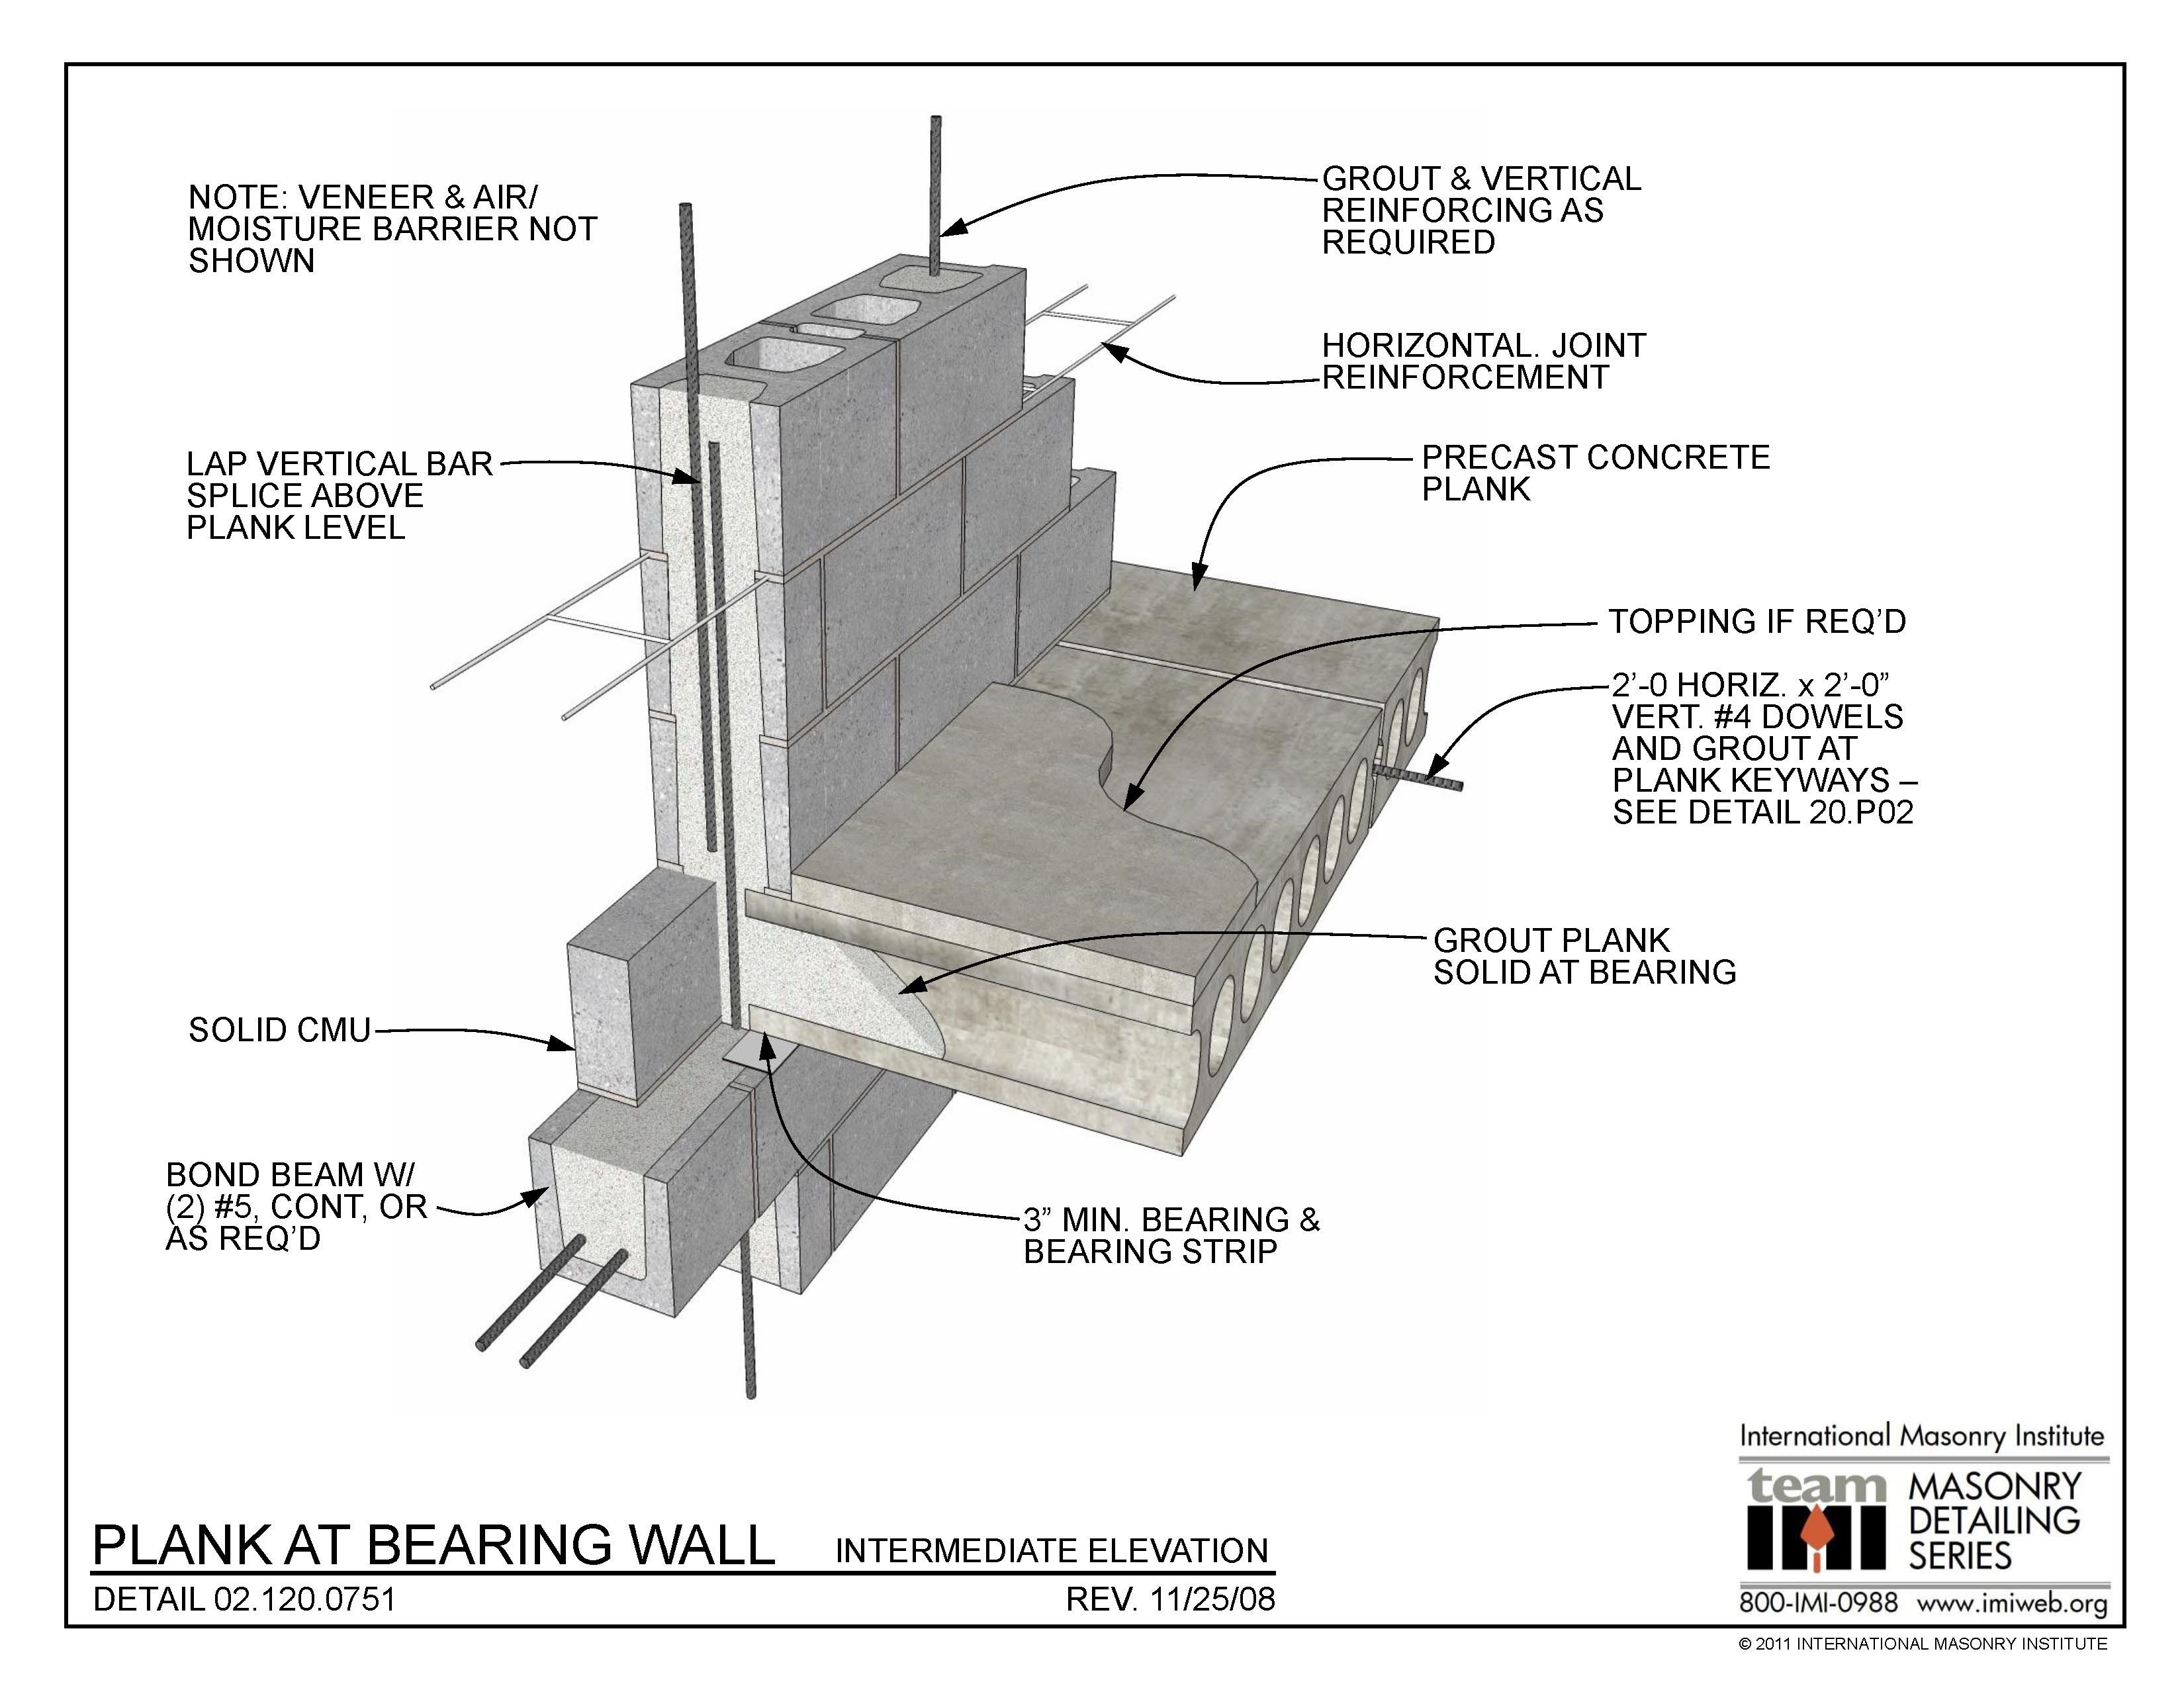 02 120 0751 Plank At Bearing Wall Intermediate Elevation International Masonry Institute Brick Construction Precast Concrete Masonry